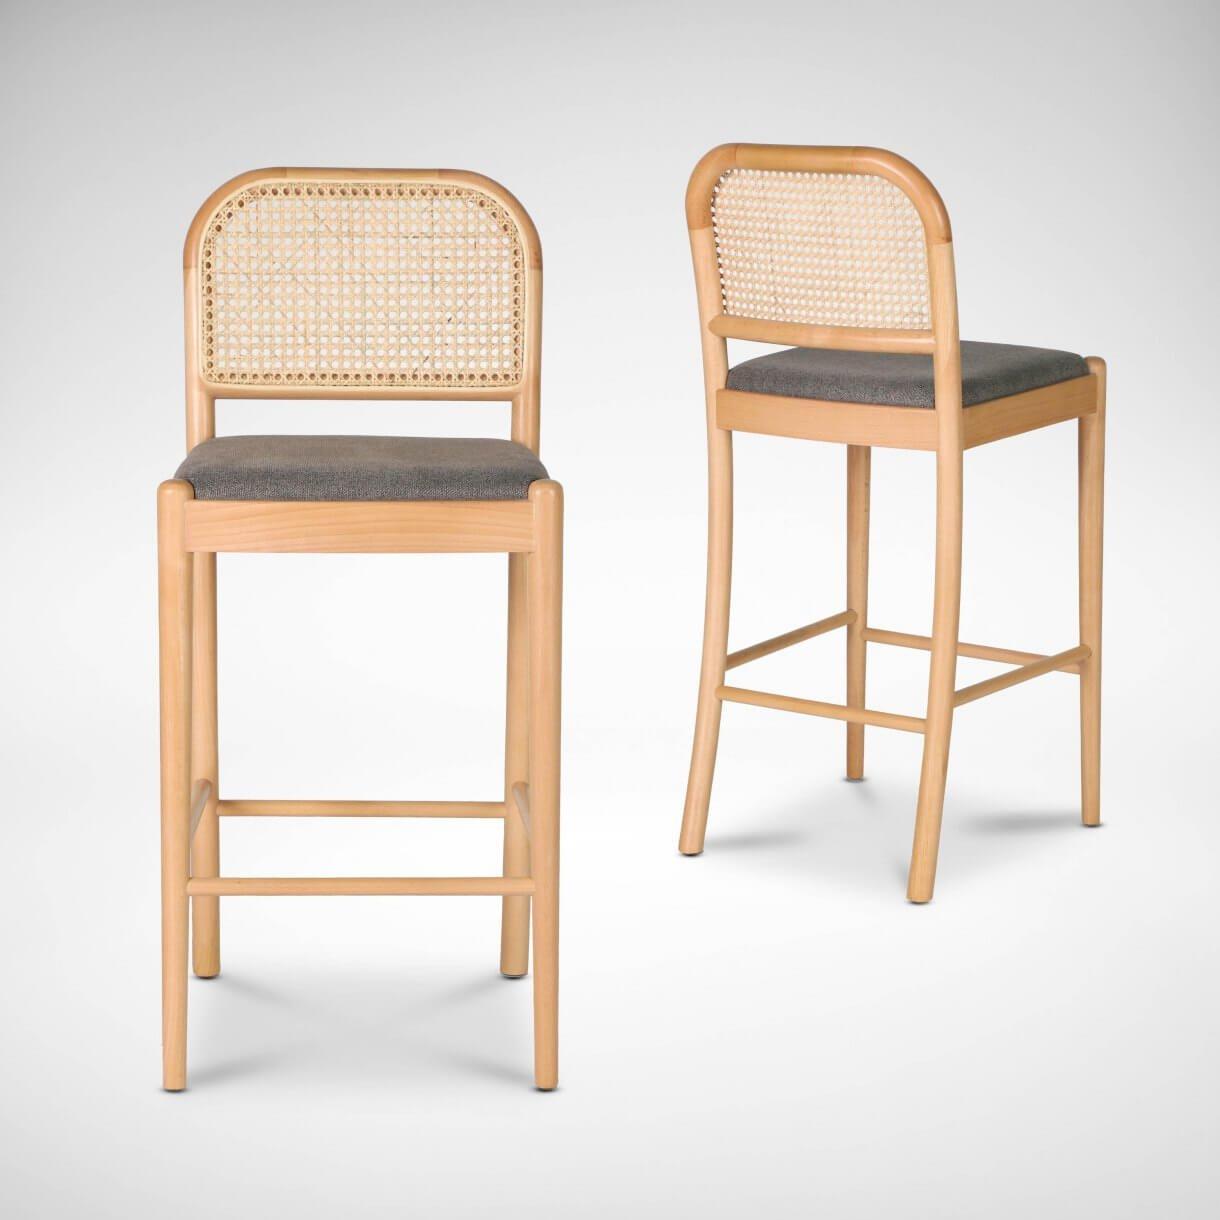 Kloop Rattan Barchair with a Modern Vintage Twist - Comfort Furniture